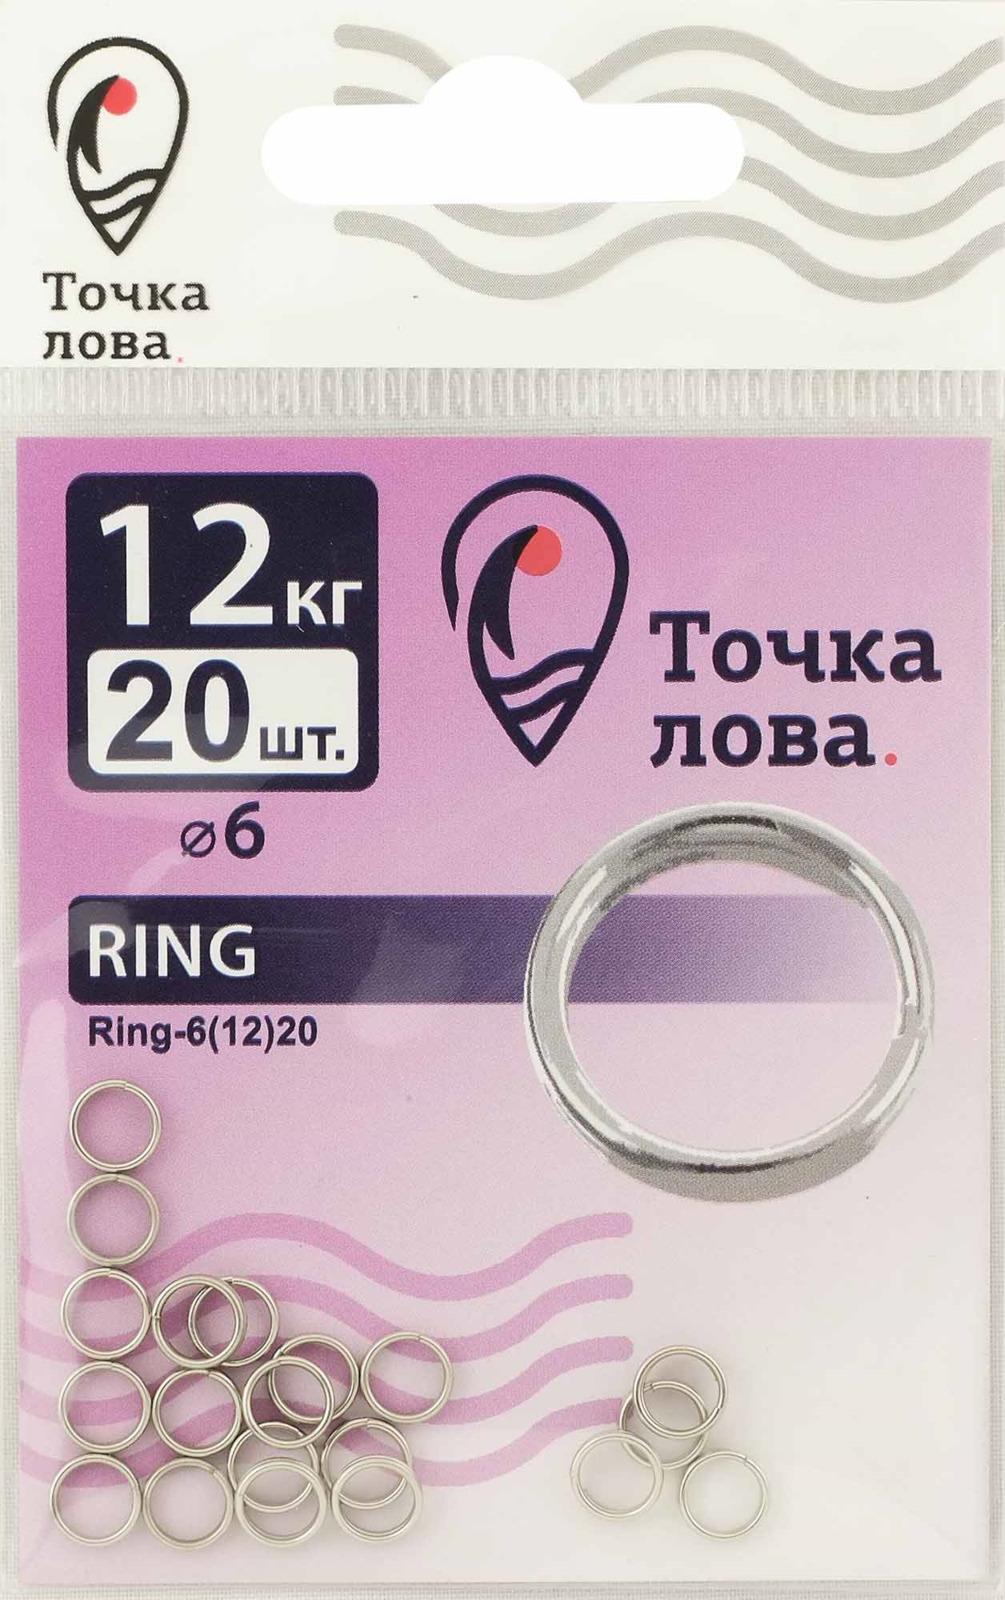 Аксессуар для рыбалки Точка Лова Заводное кольцо, Ring-6(12), 20 шт